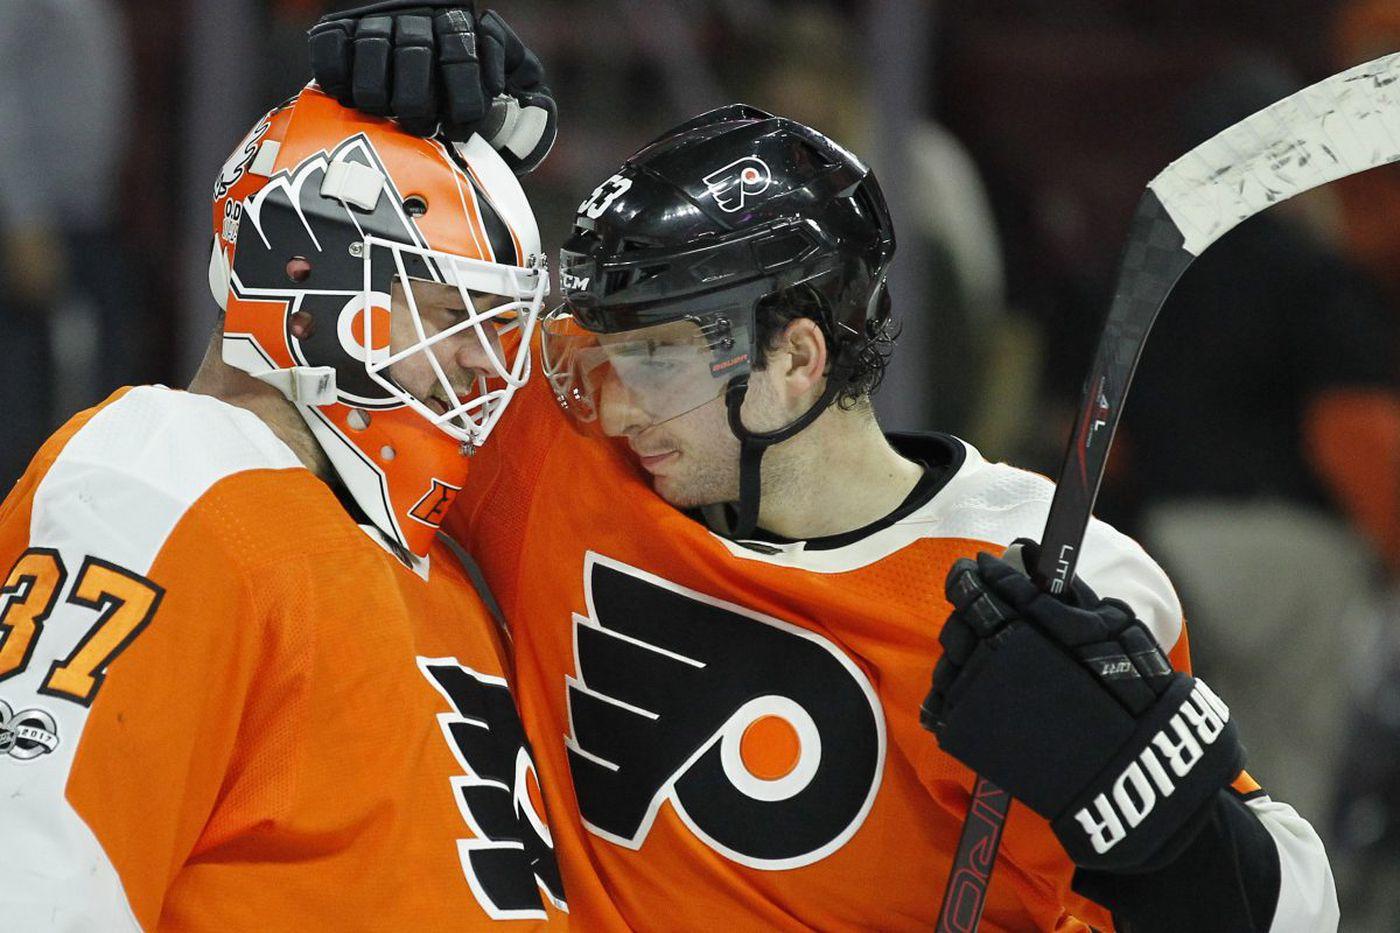 Subtle changes helped turn around Flyers' season and make hockey fun again